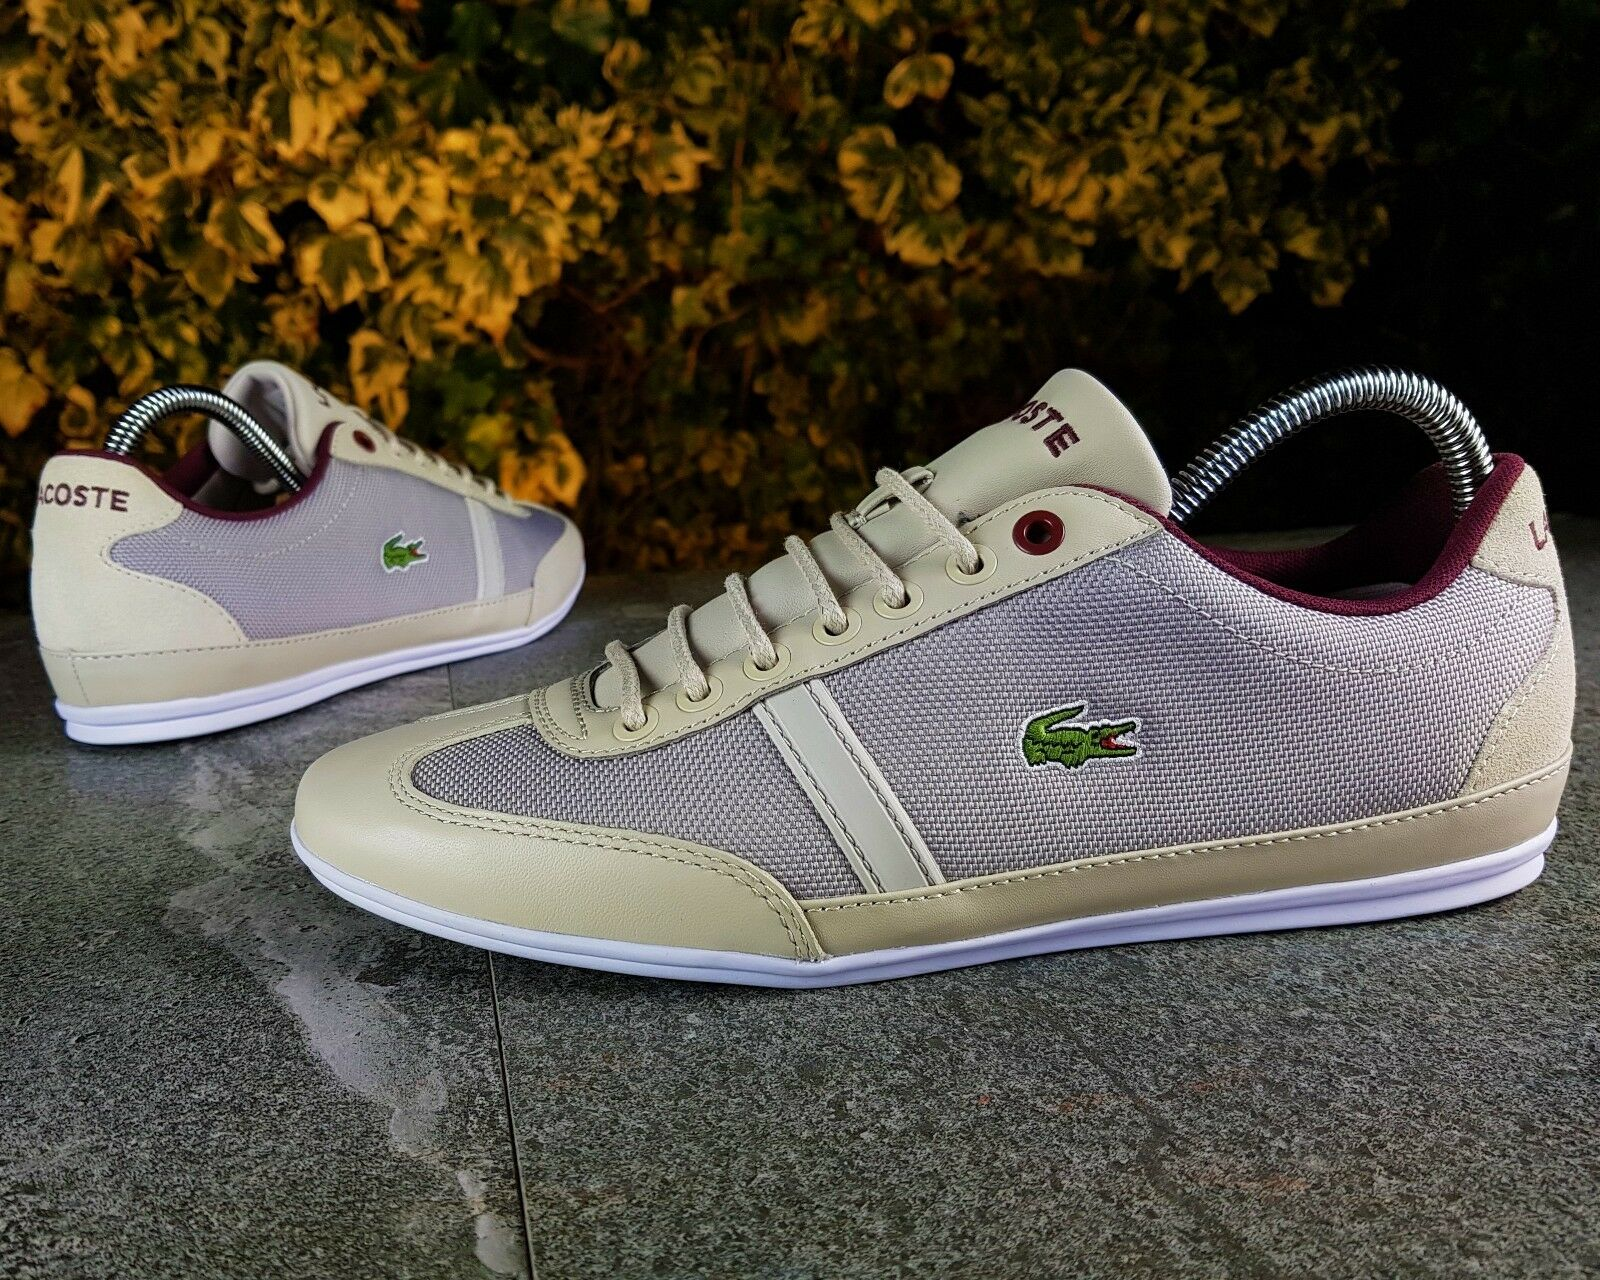 BNWB BNWB BNWB & Authentic Lacoste ® Misano SP Sport Luce Grigio Ecru scarpe da ginnastica | lusso  | Uomini/Donne Scarpa  be2f93